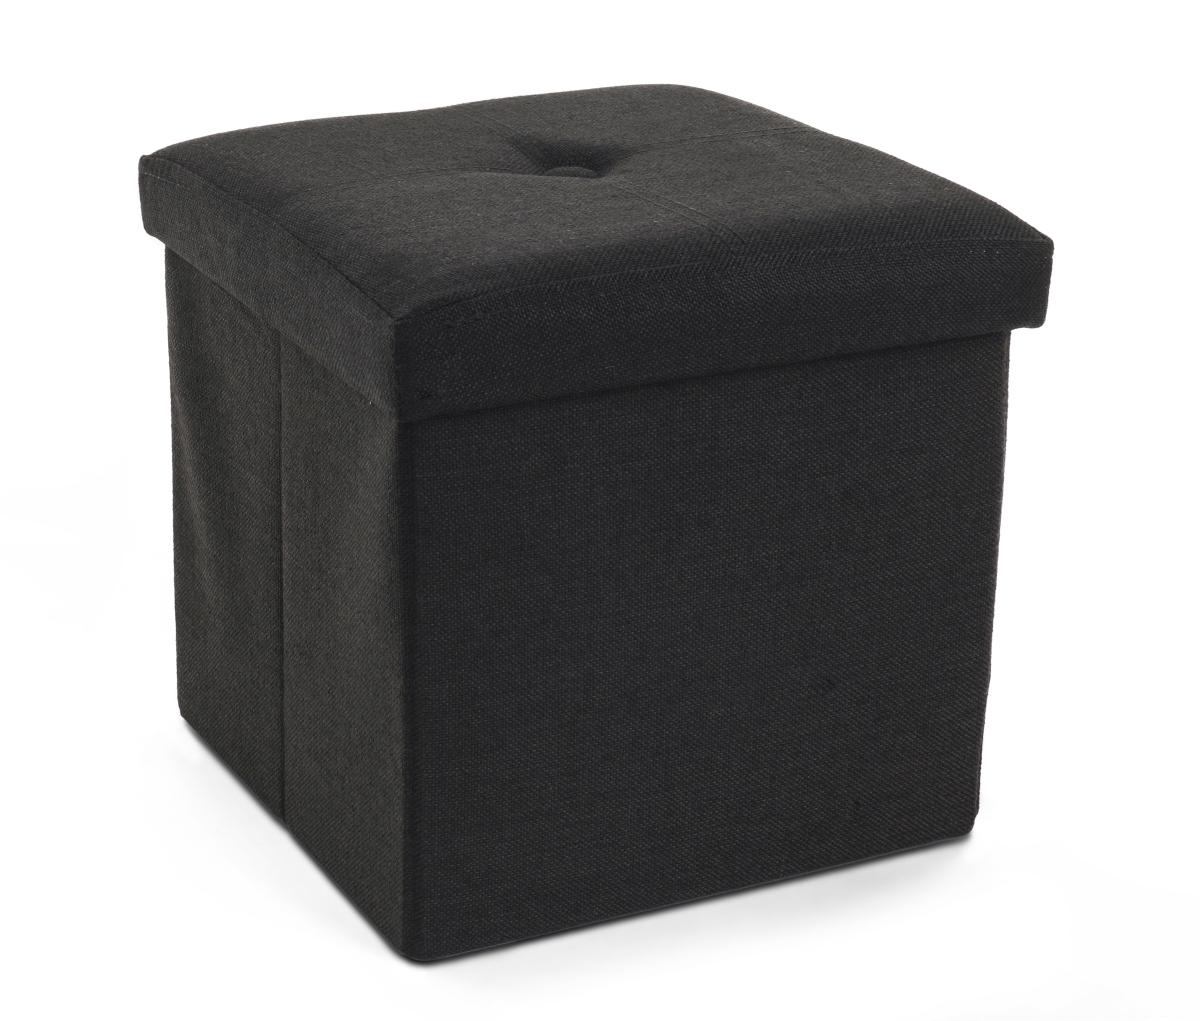 https://dedra.blob.core.windows.net/cms/ContentItems/22464_sedaci-boxer-skladaci-taburet-s-uloznym-prostorem/images/fc18861-01.jpg